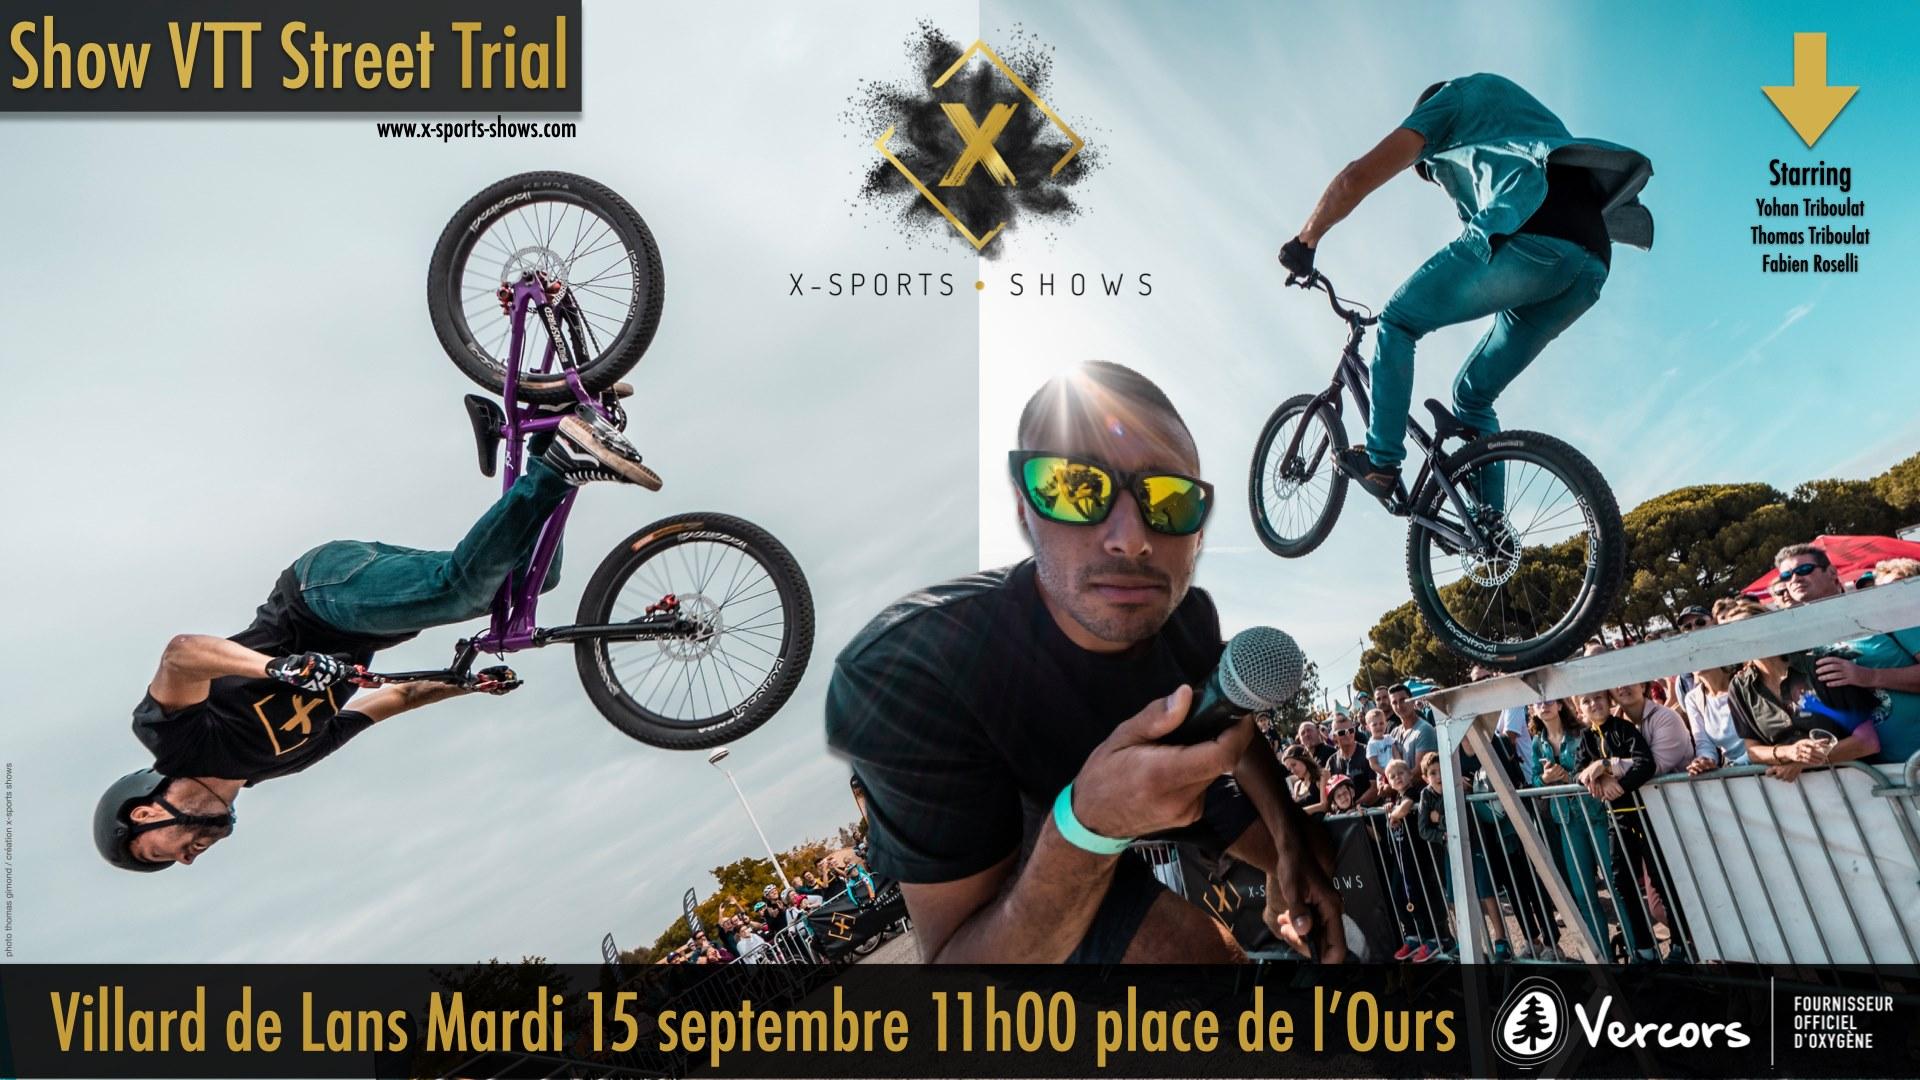 show VTT arrivée du Tour Villard de Lans 15 septembre